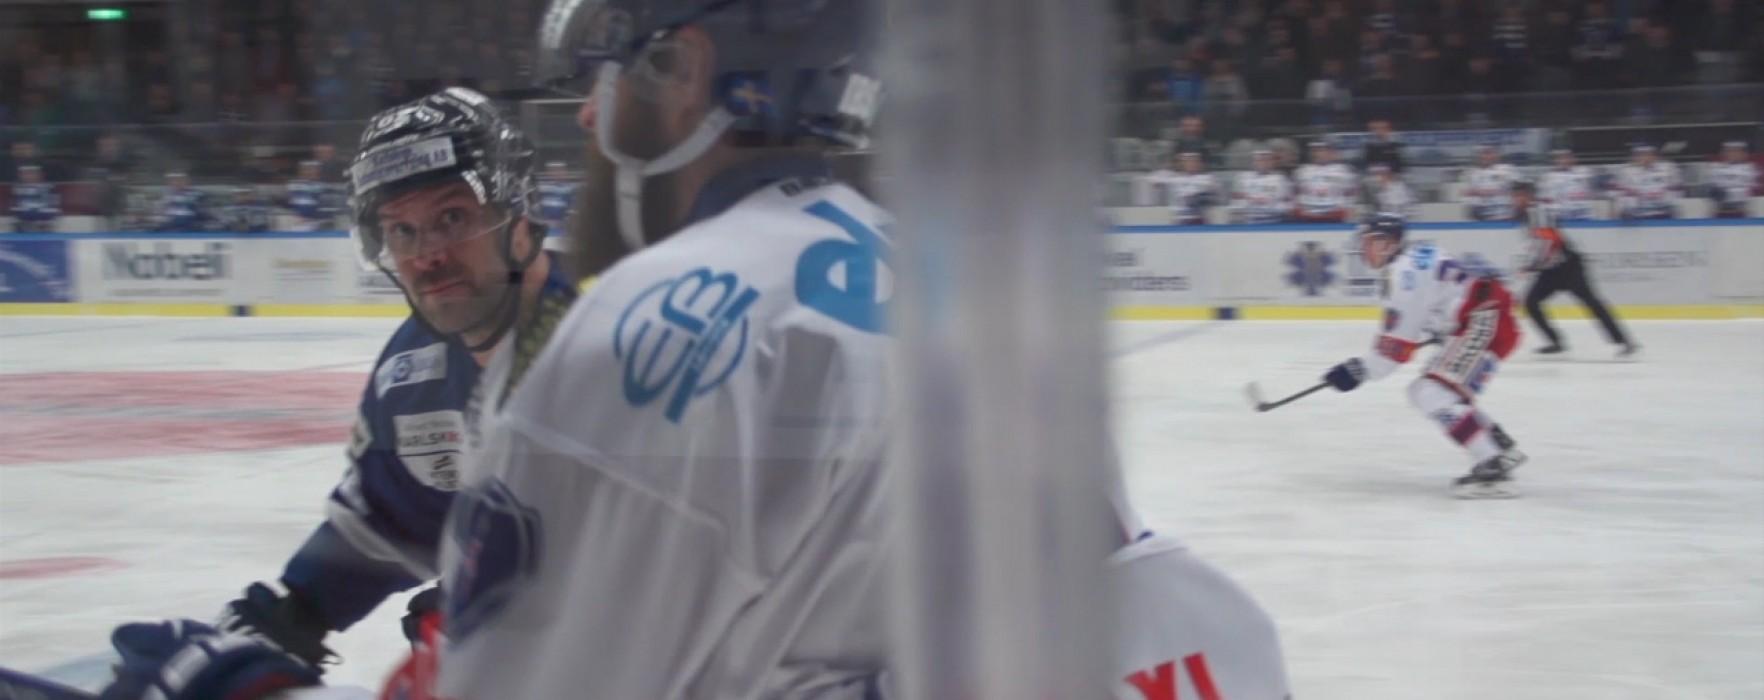 Glimt Sport – Daniel Wessner och Christian Berglund